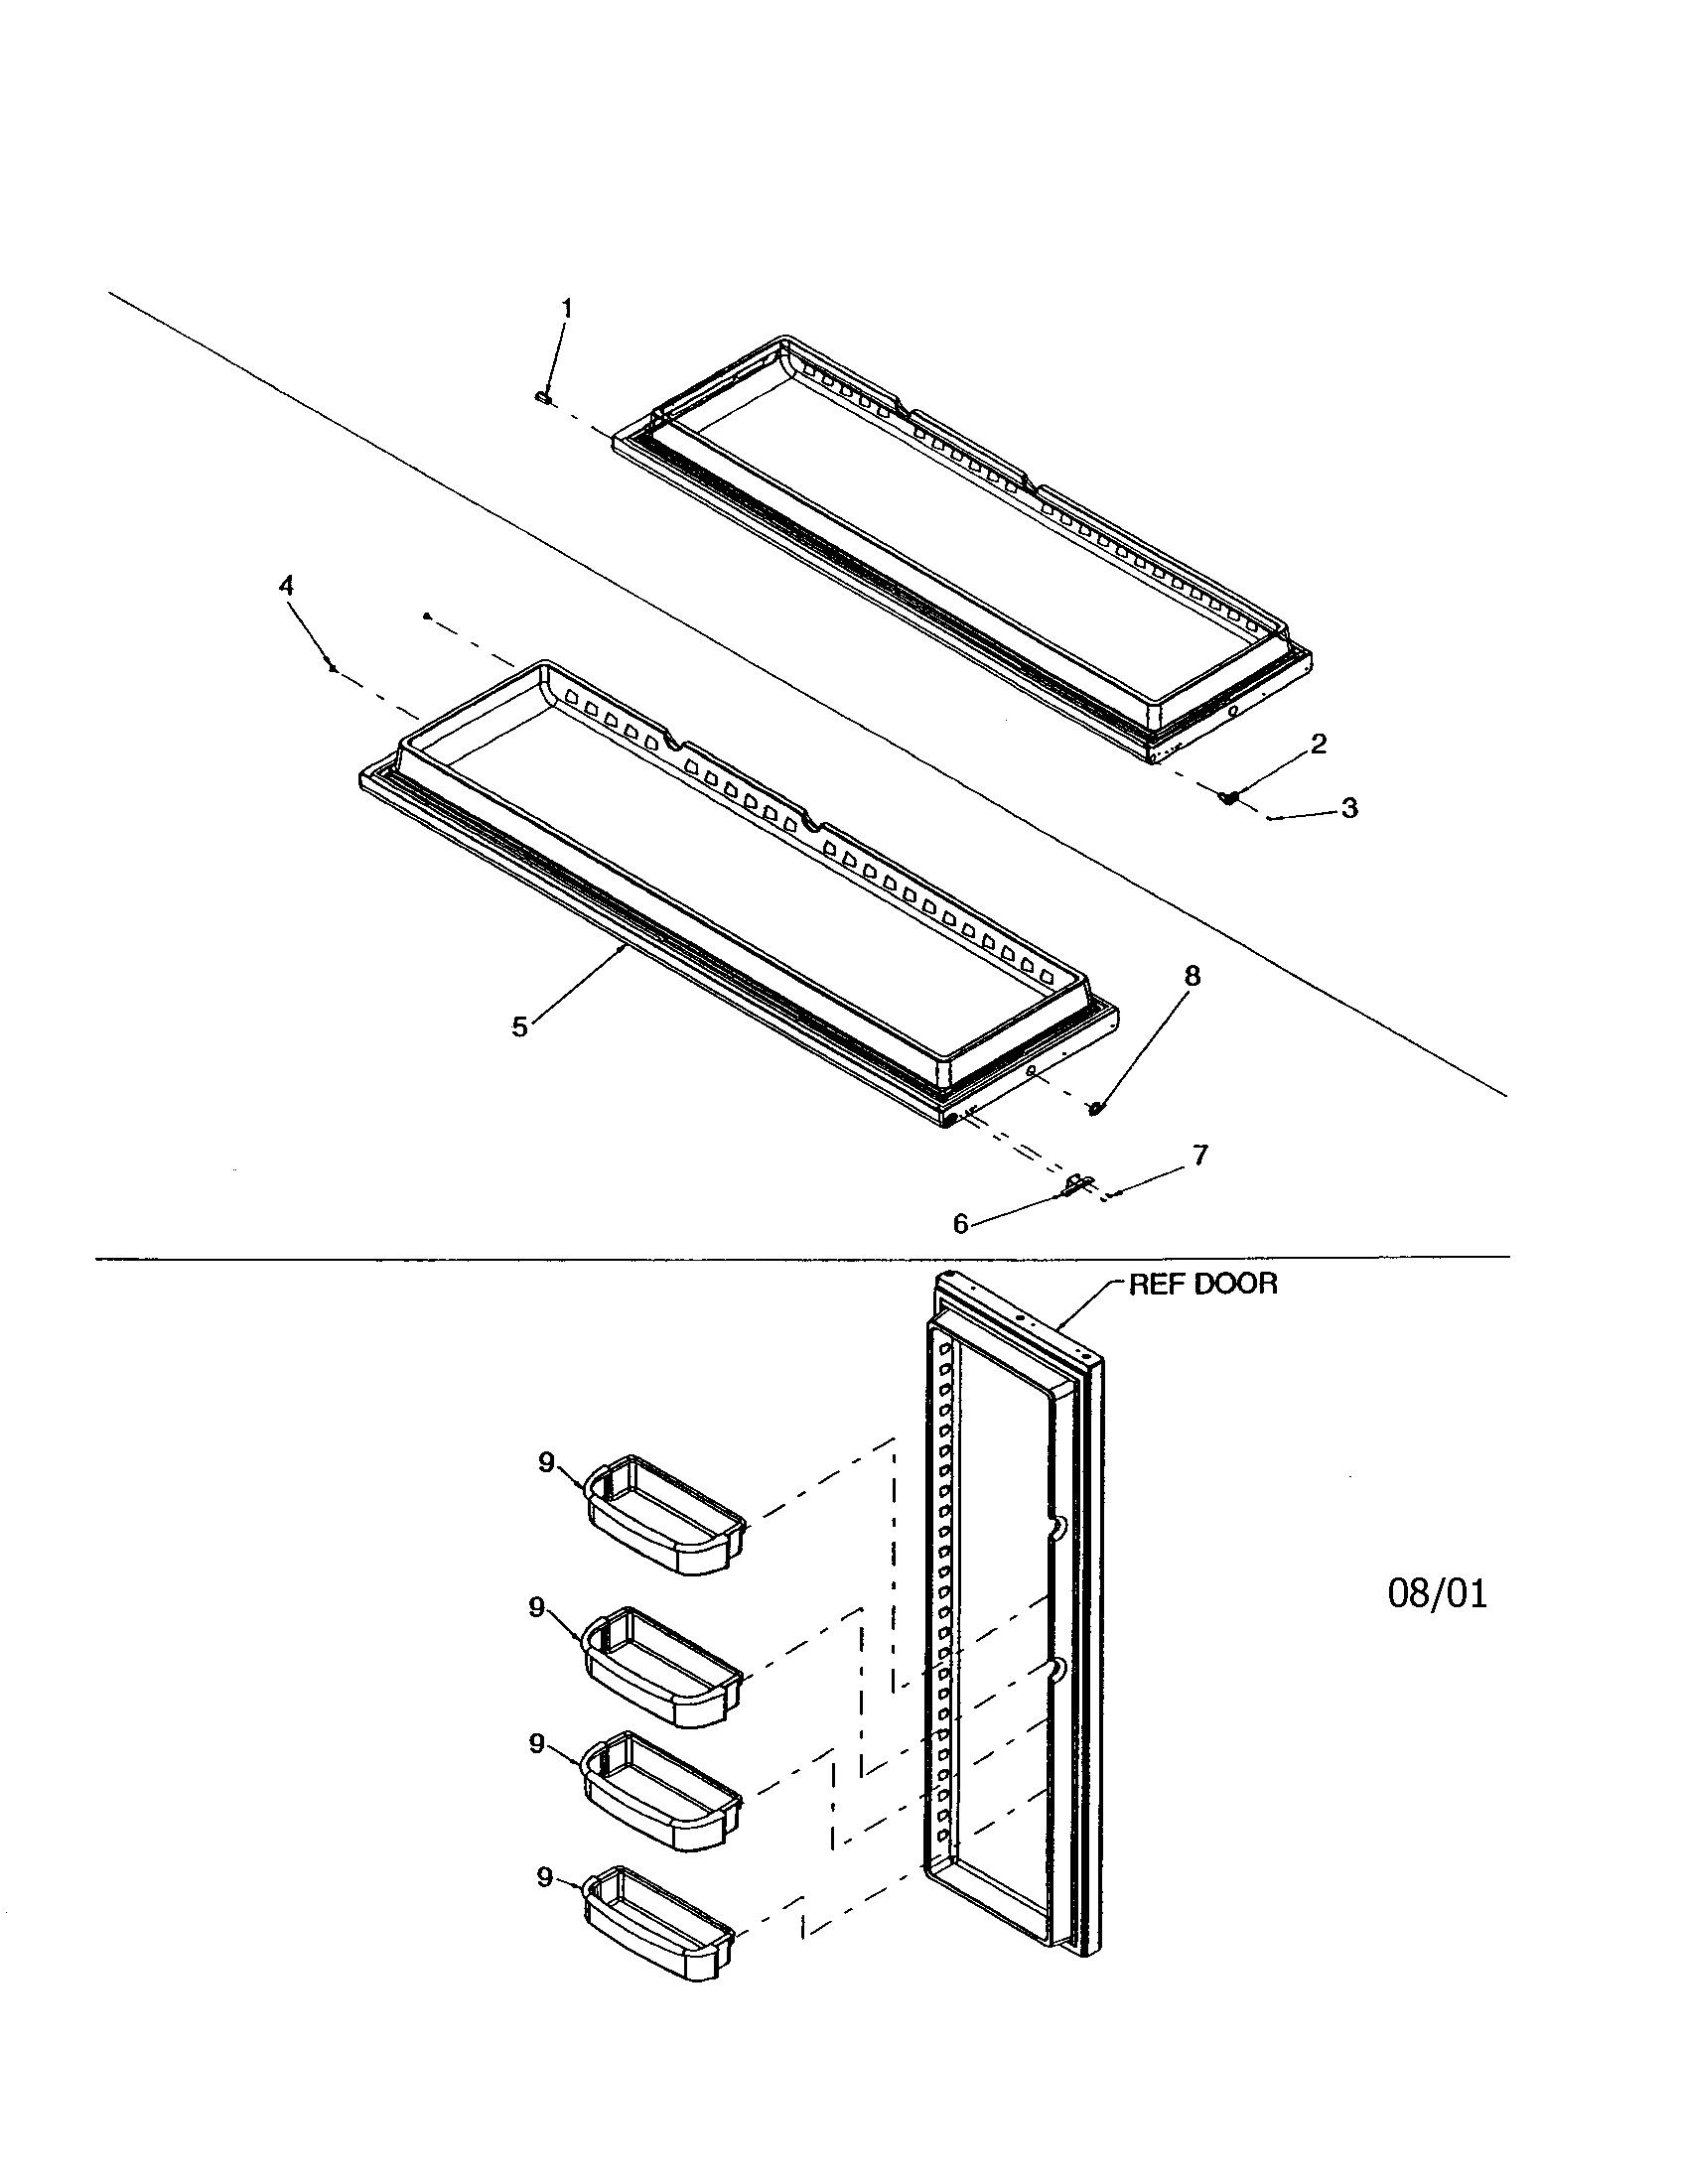 kenmore refrigerator parts manual model 106.74262400 parts numbers